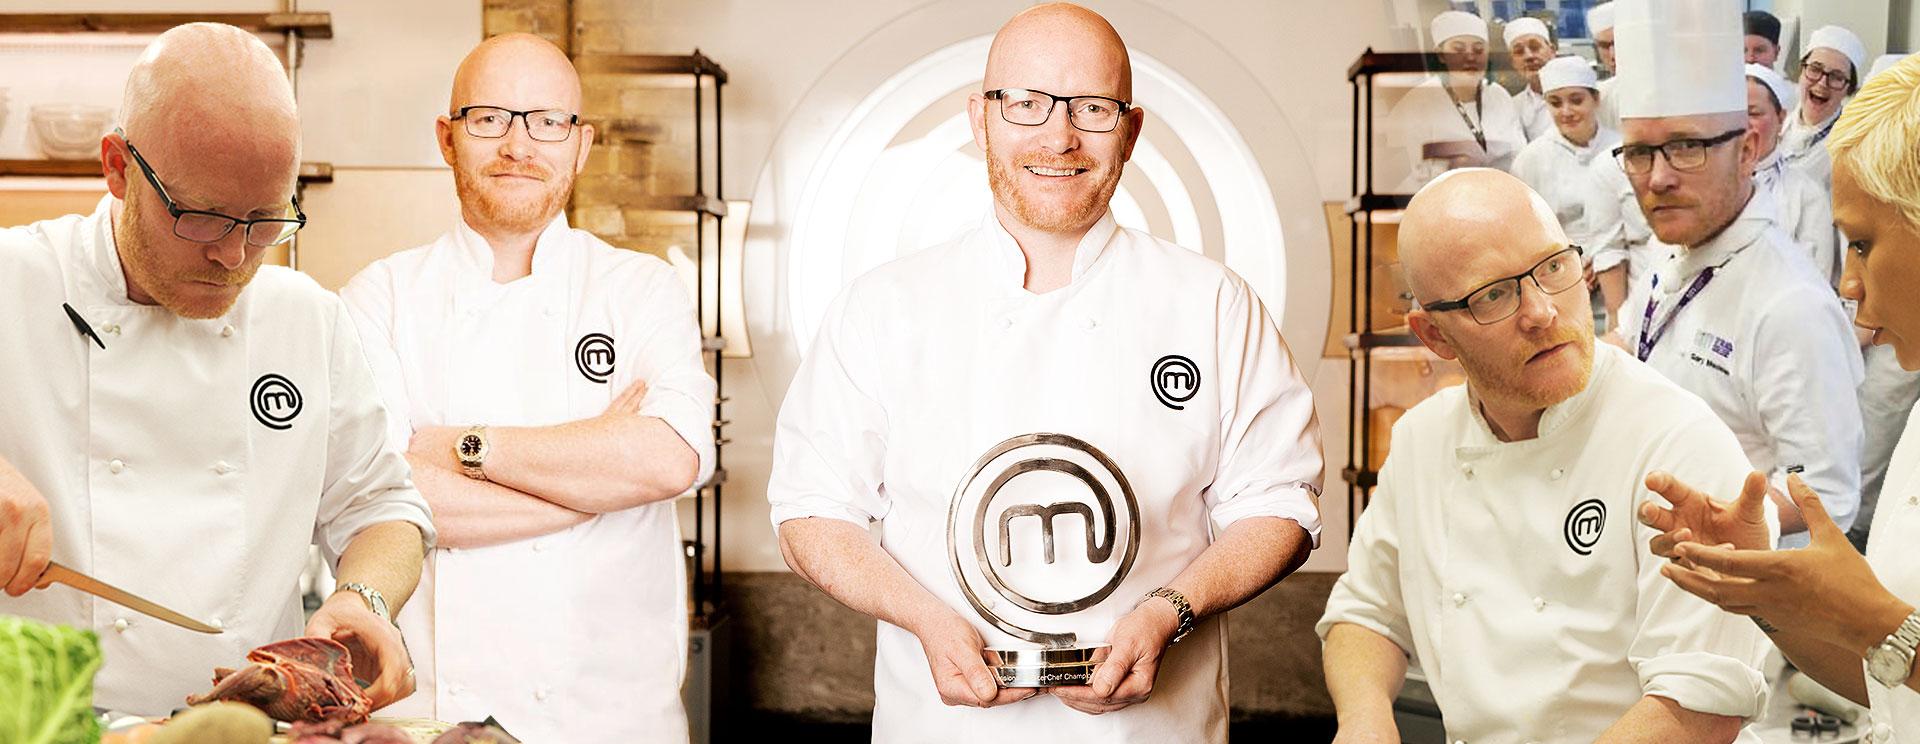 Chef Gary Maclean - Award winning Chef and Winner of MasterChef The Professionals